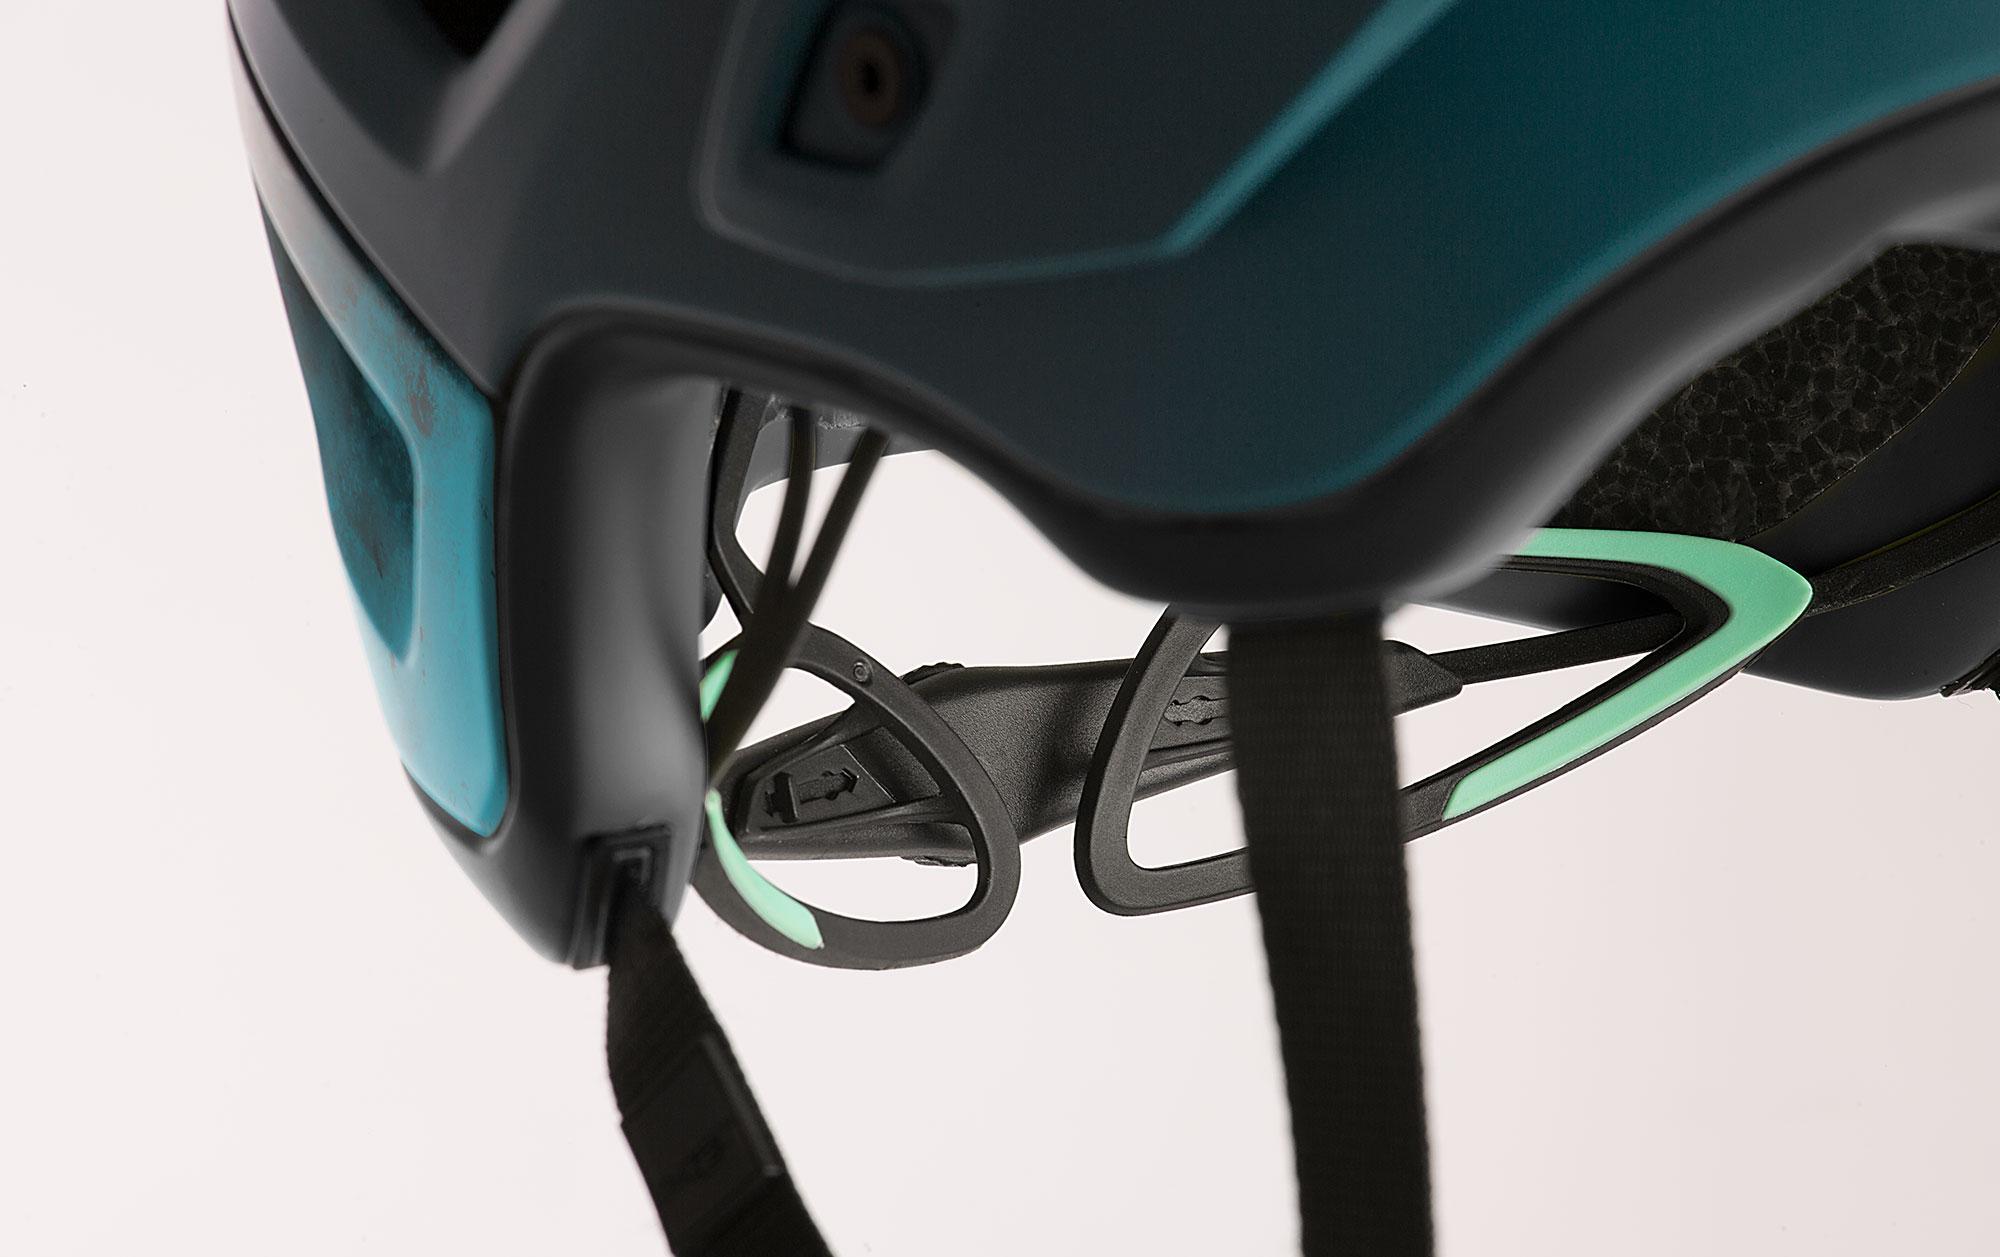 MET Roam Mips Enduro, Trail and E-MTB Helmet Retention System